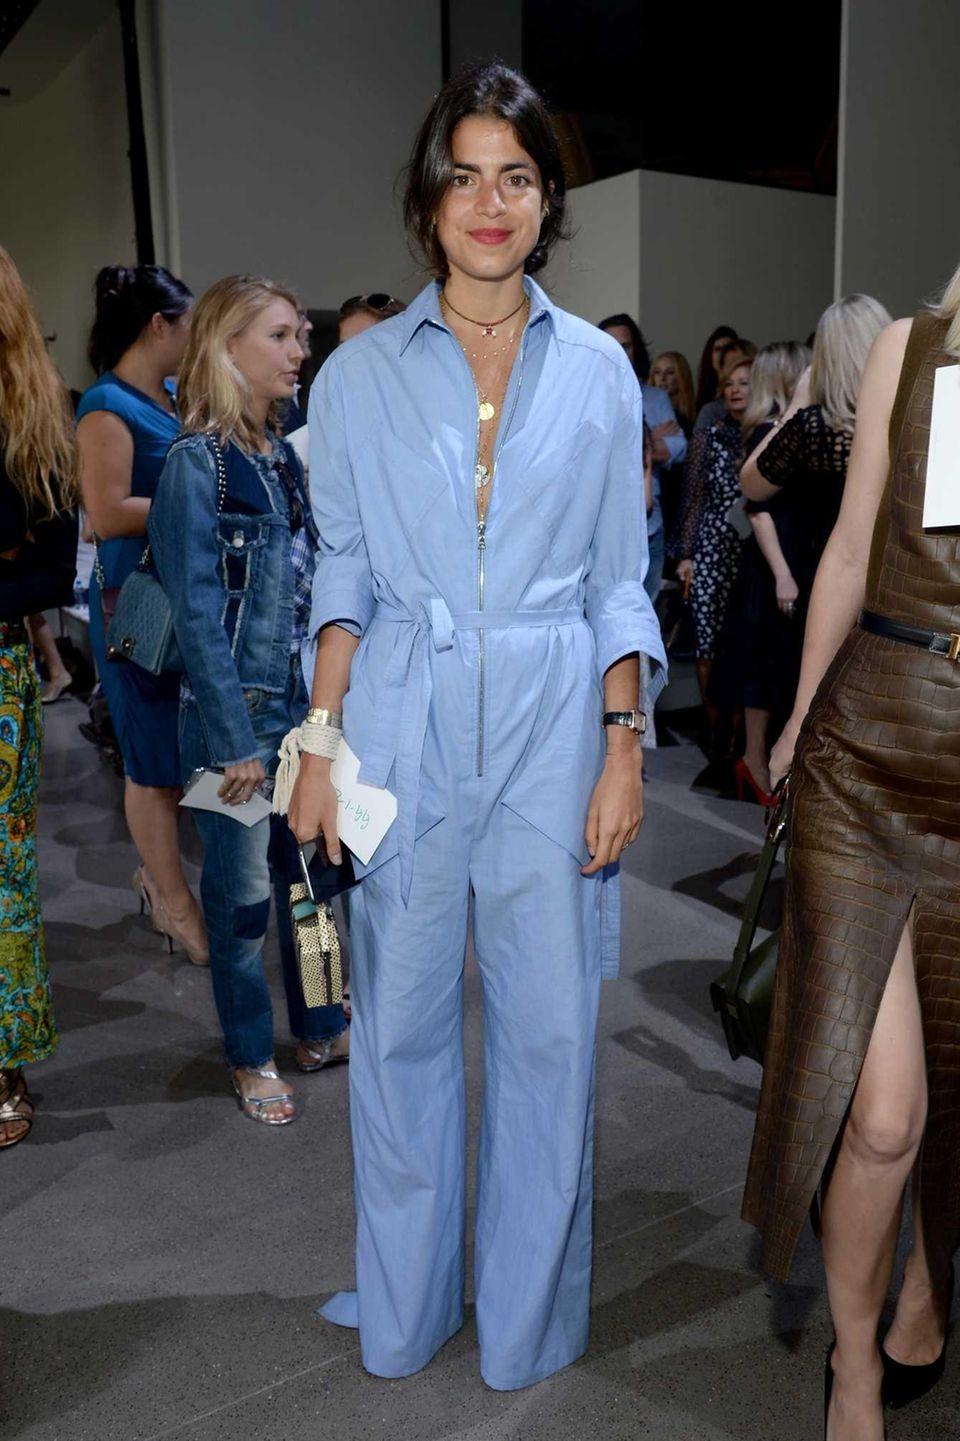 Blogger Leandra Medine attends the Jason Wu fashion